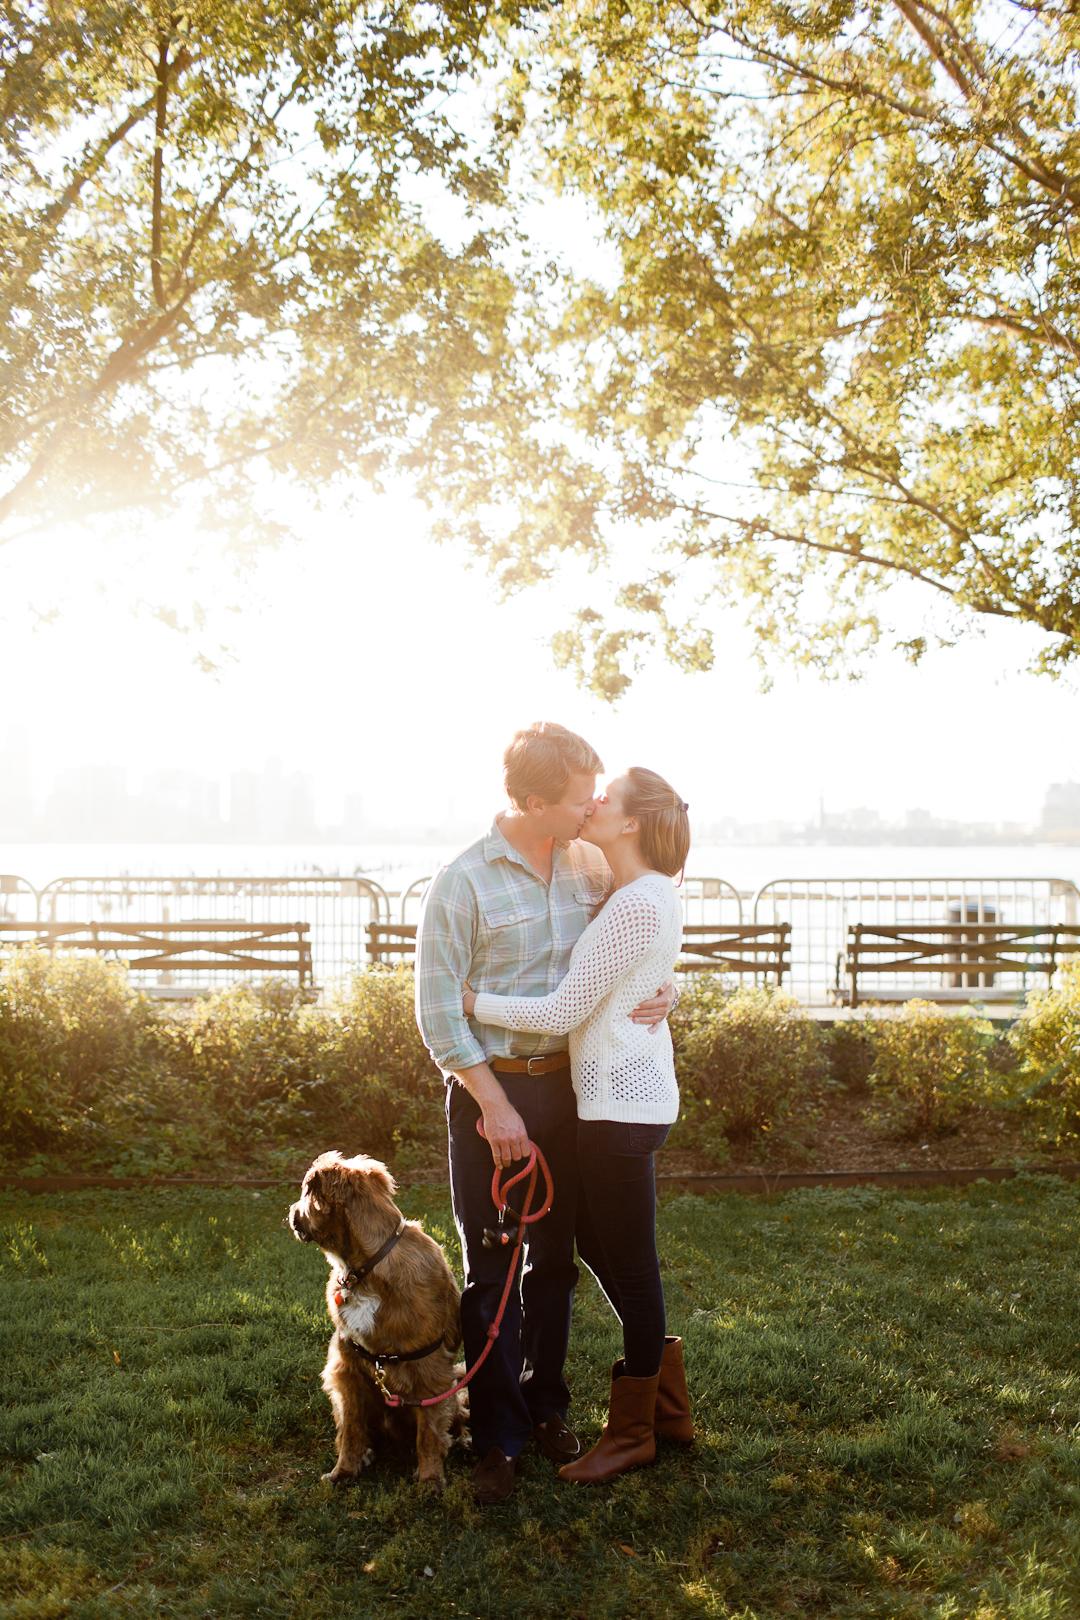 Melissa Kruse Photography - Megan & Tyler West Village Engagement Photos-105.jpg